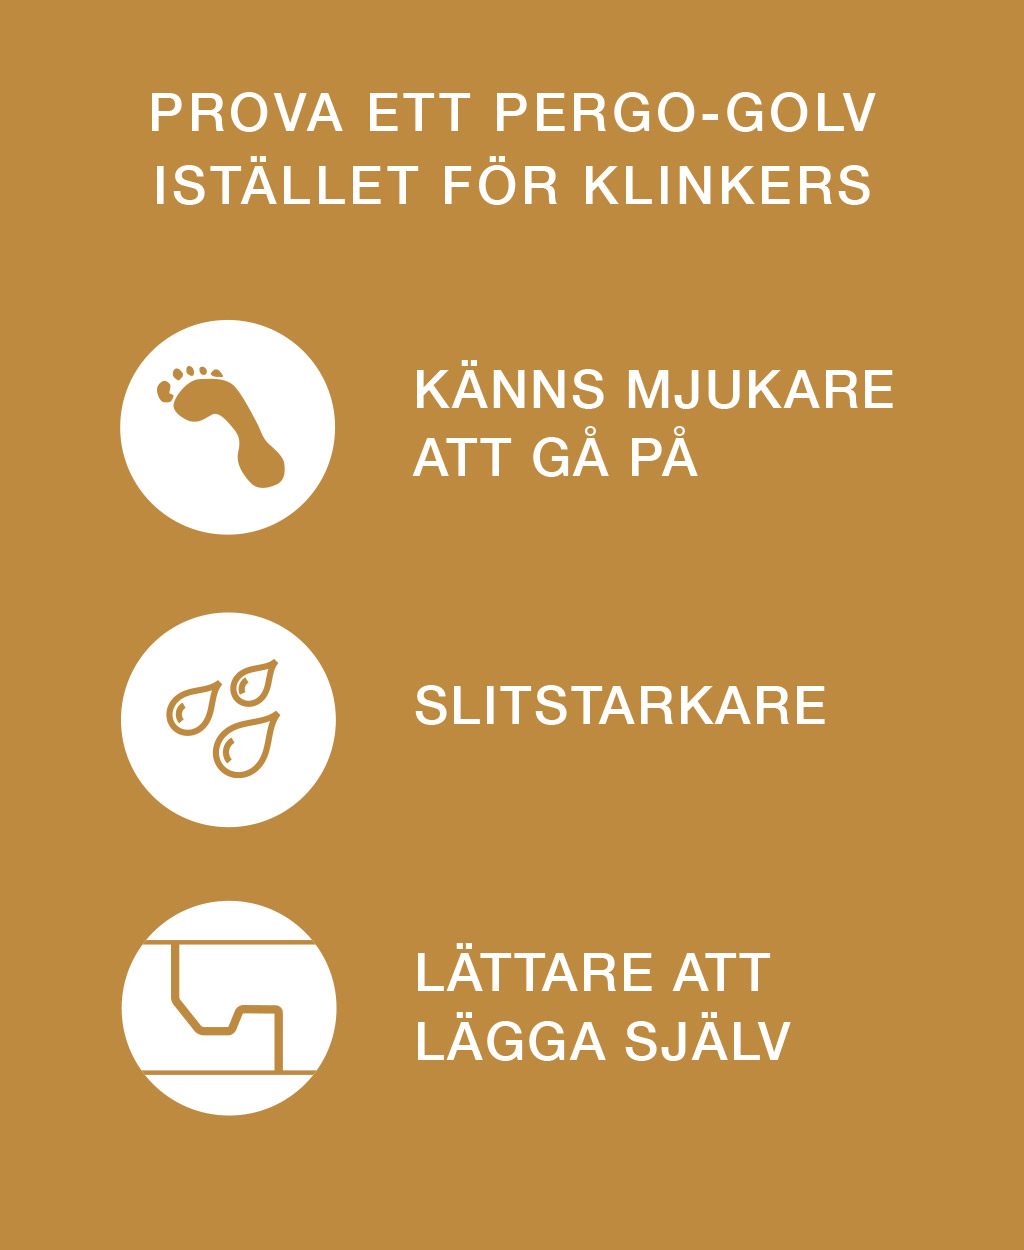 Pergo-infographics-glom-klinkergolv-prova-ett-pergogolvistallet